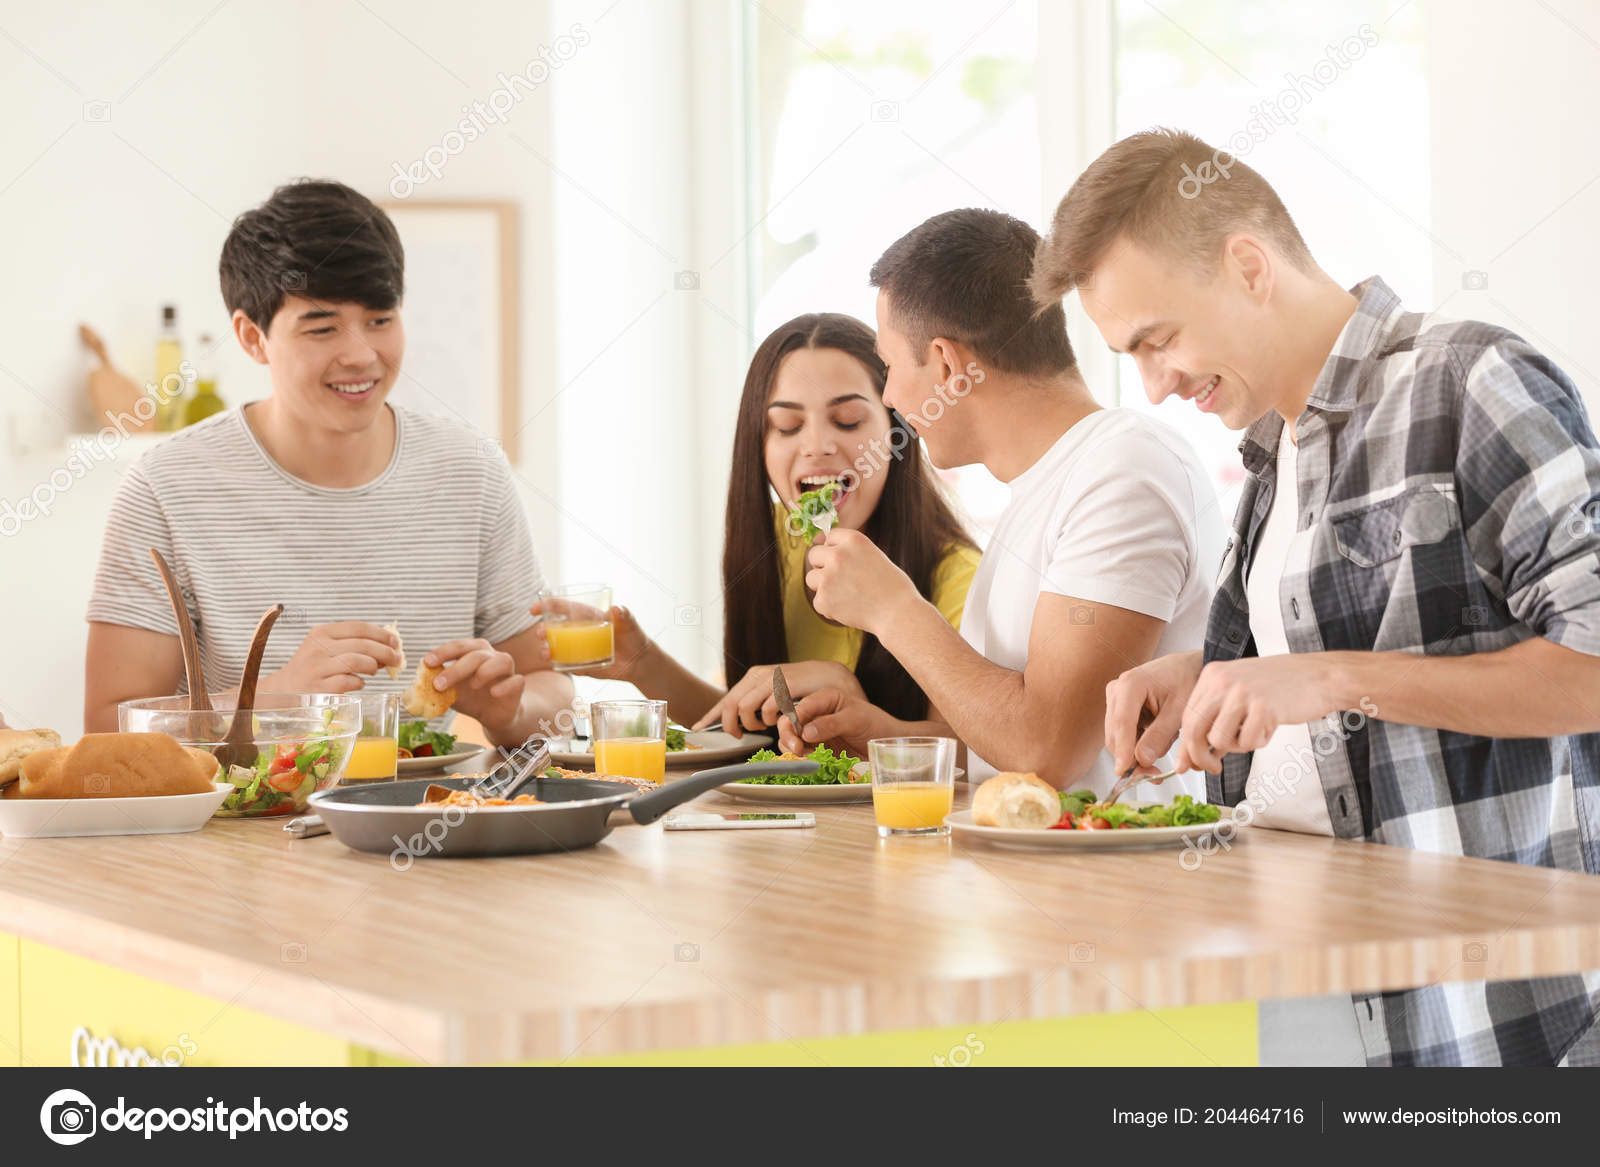 Fine Friends Eating Table Kitchen Stock Photo C Serezniy 204464716 Download Free Architecture Designs Embacsunscenecom